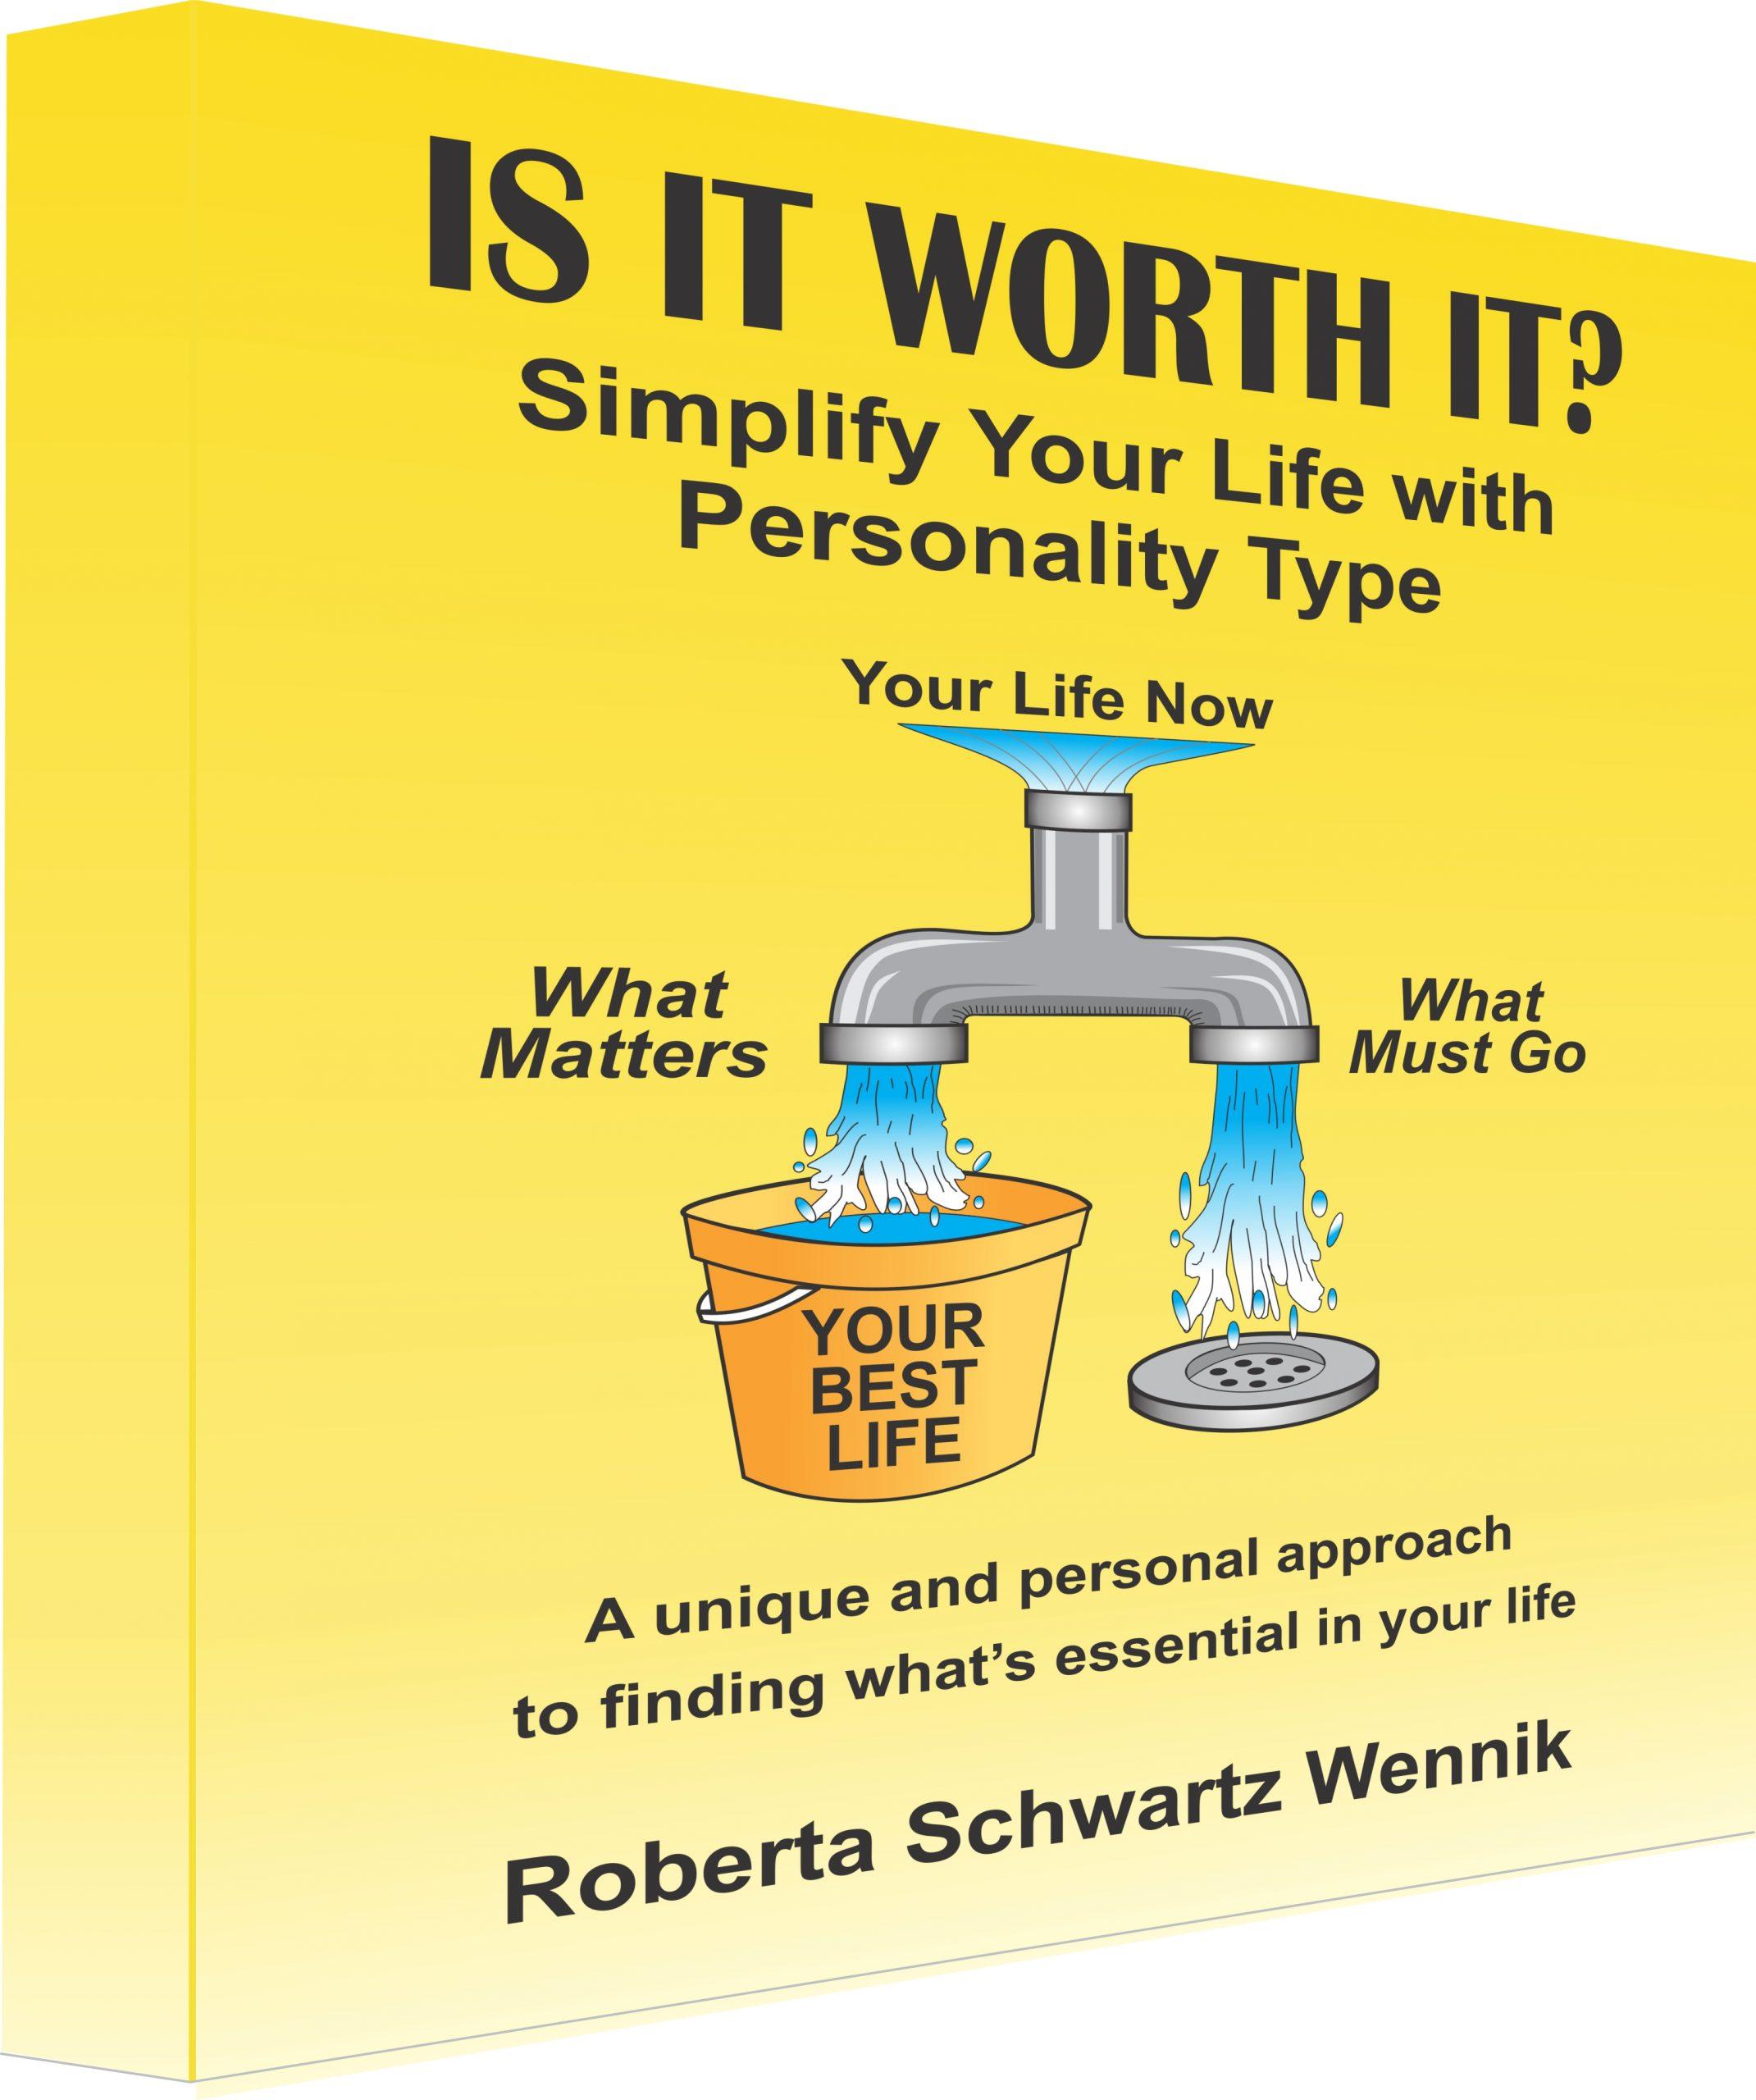 Is It Worth It? by Roberta Schwartz Wennik, MS RDN